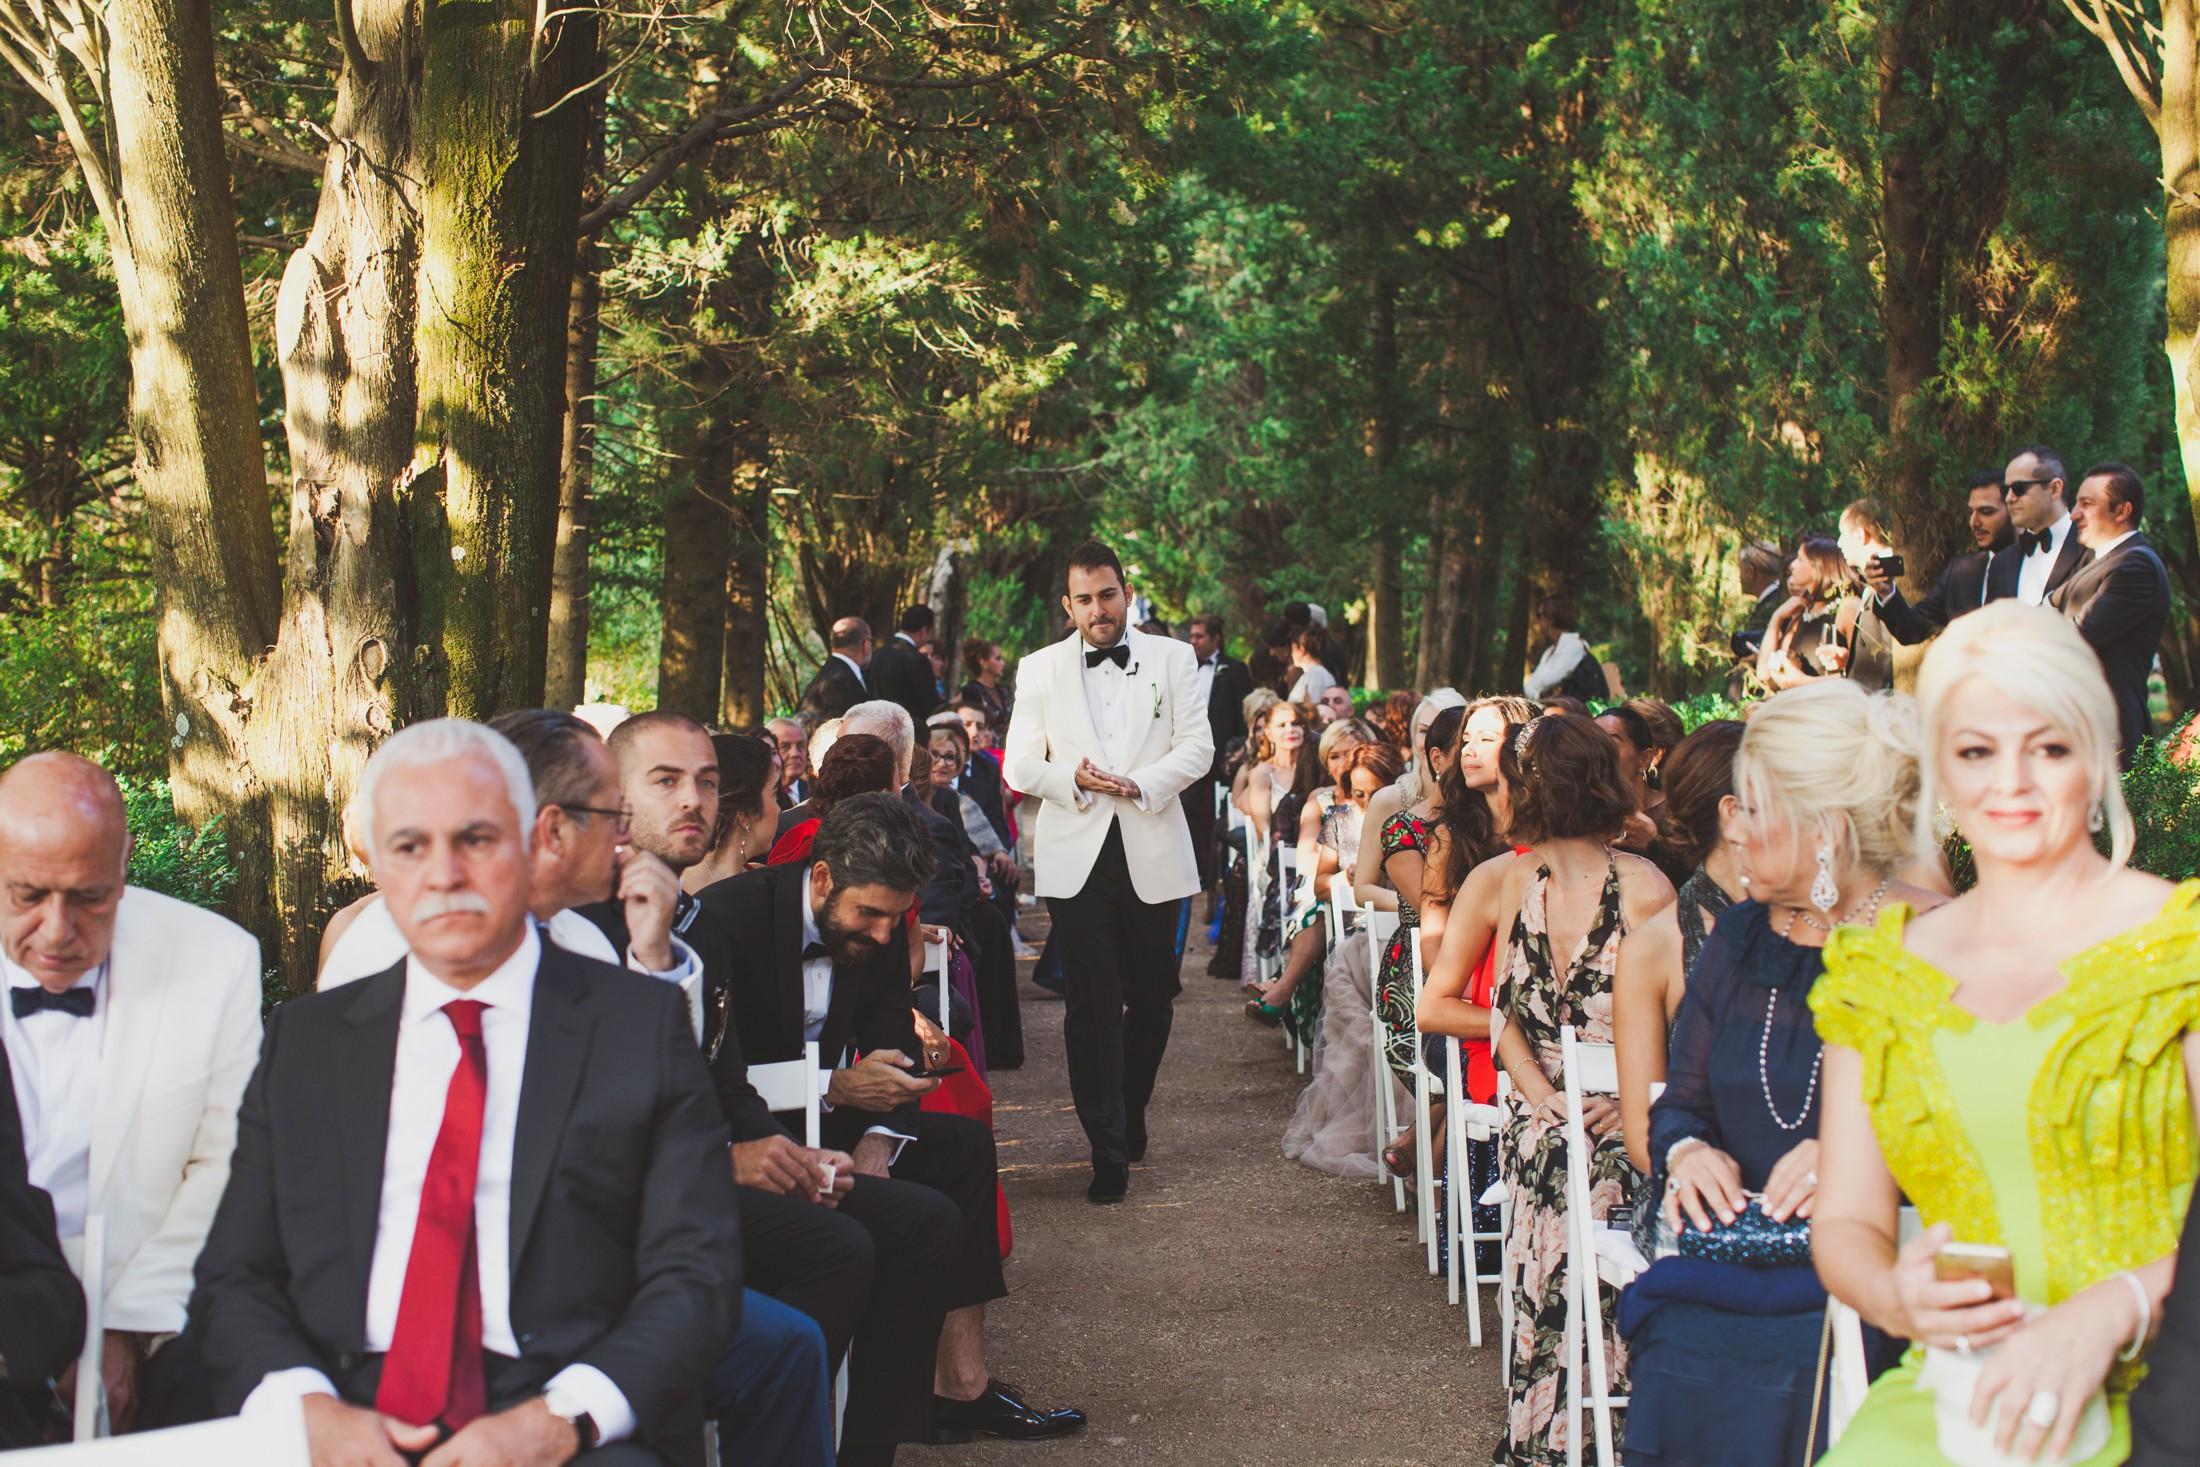 luxury wedding the groom arrives at the wedding ceremony in villa cimbrone ravello